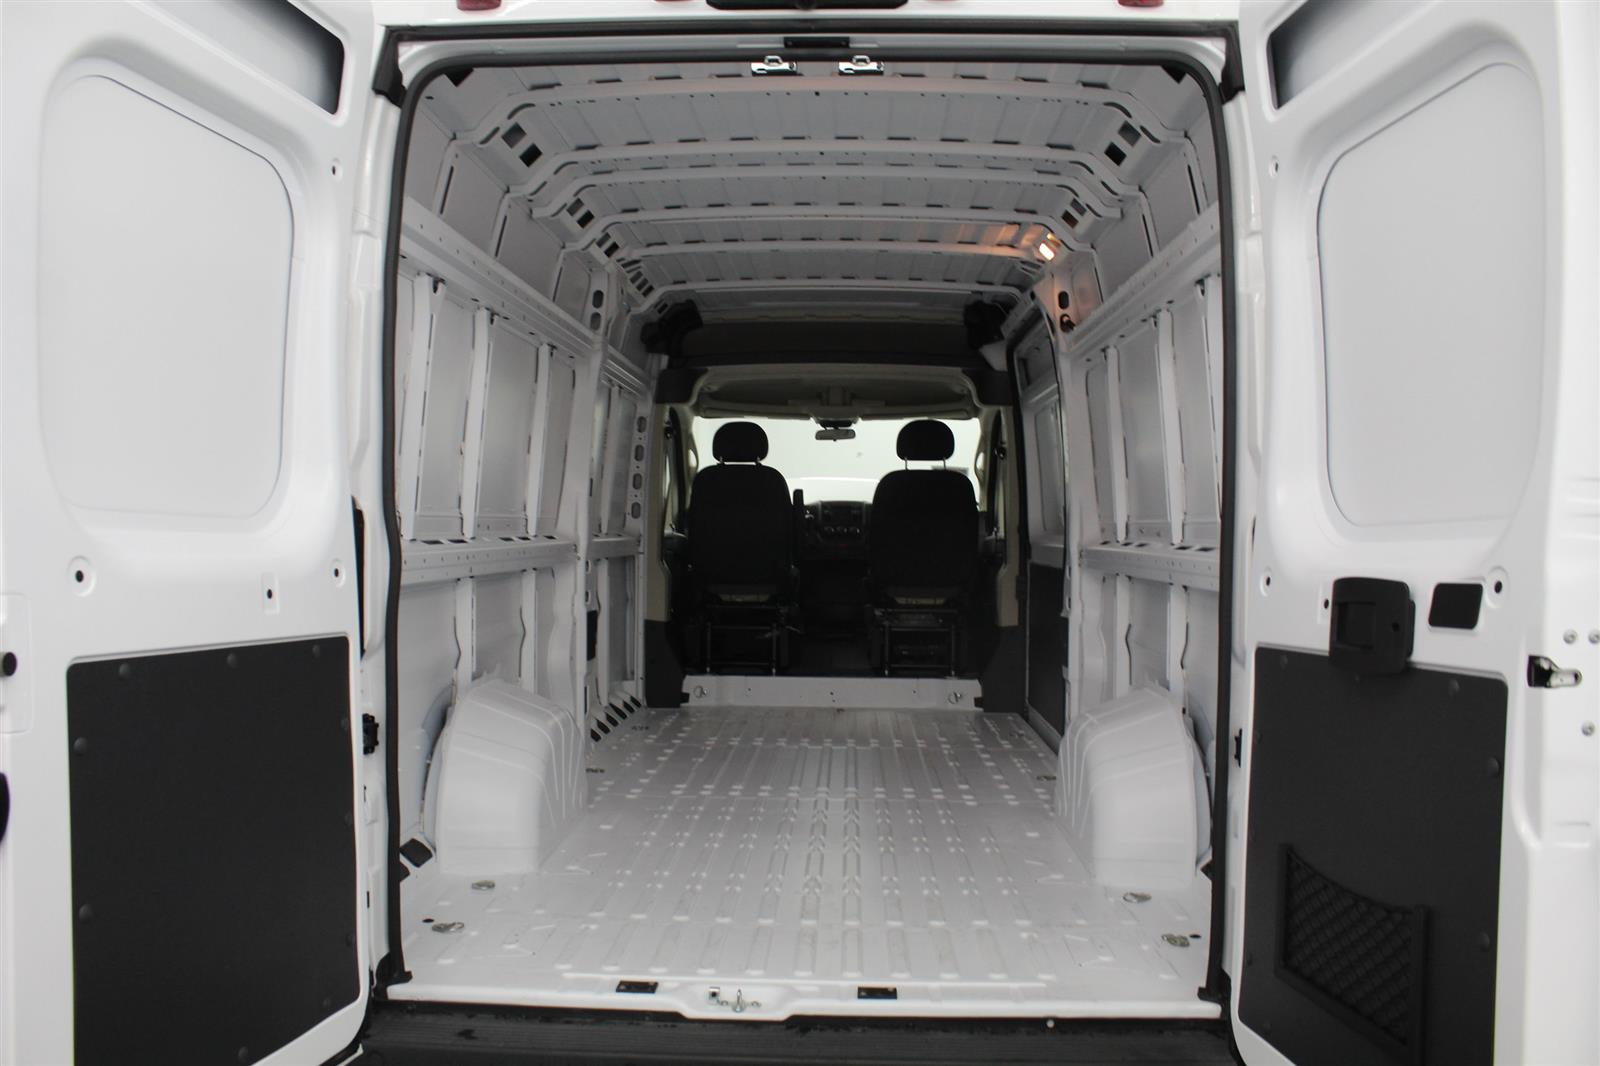 2021 Ram ProMaster 3500 FWD, Empty Cargo Van #ME510060 - photo 1